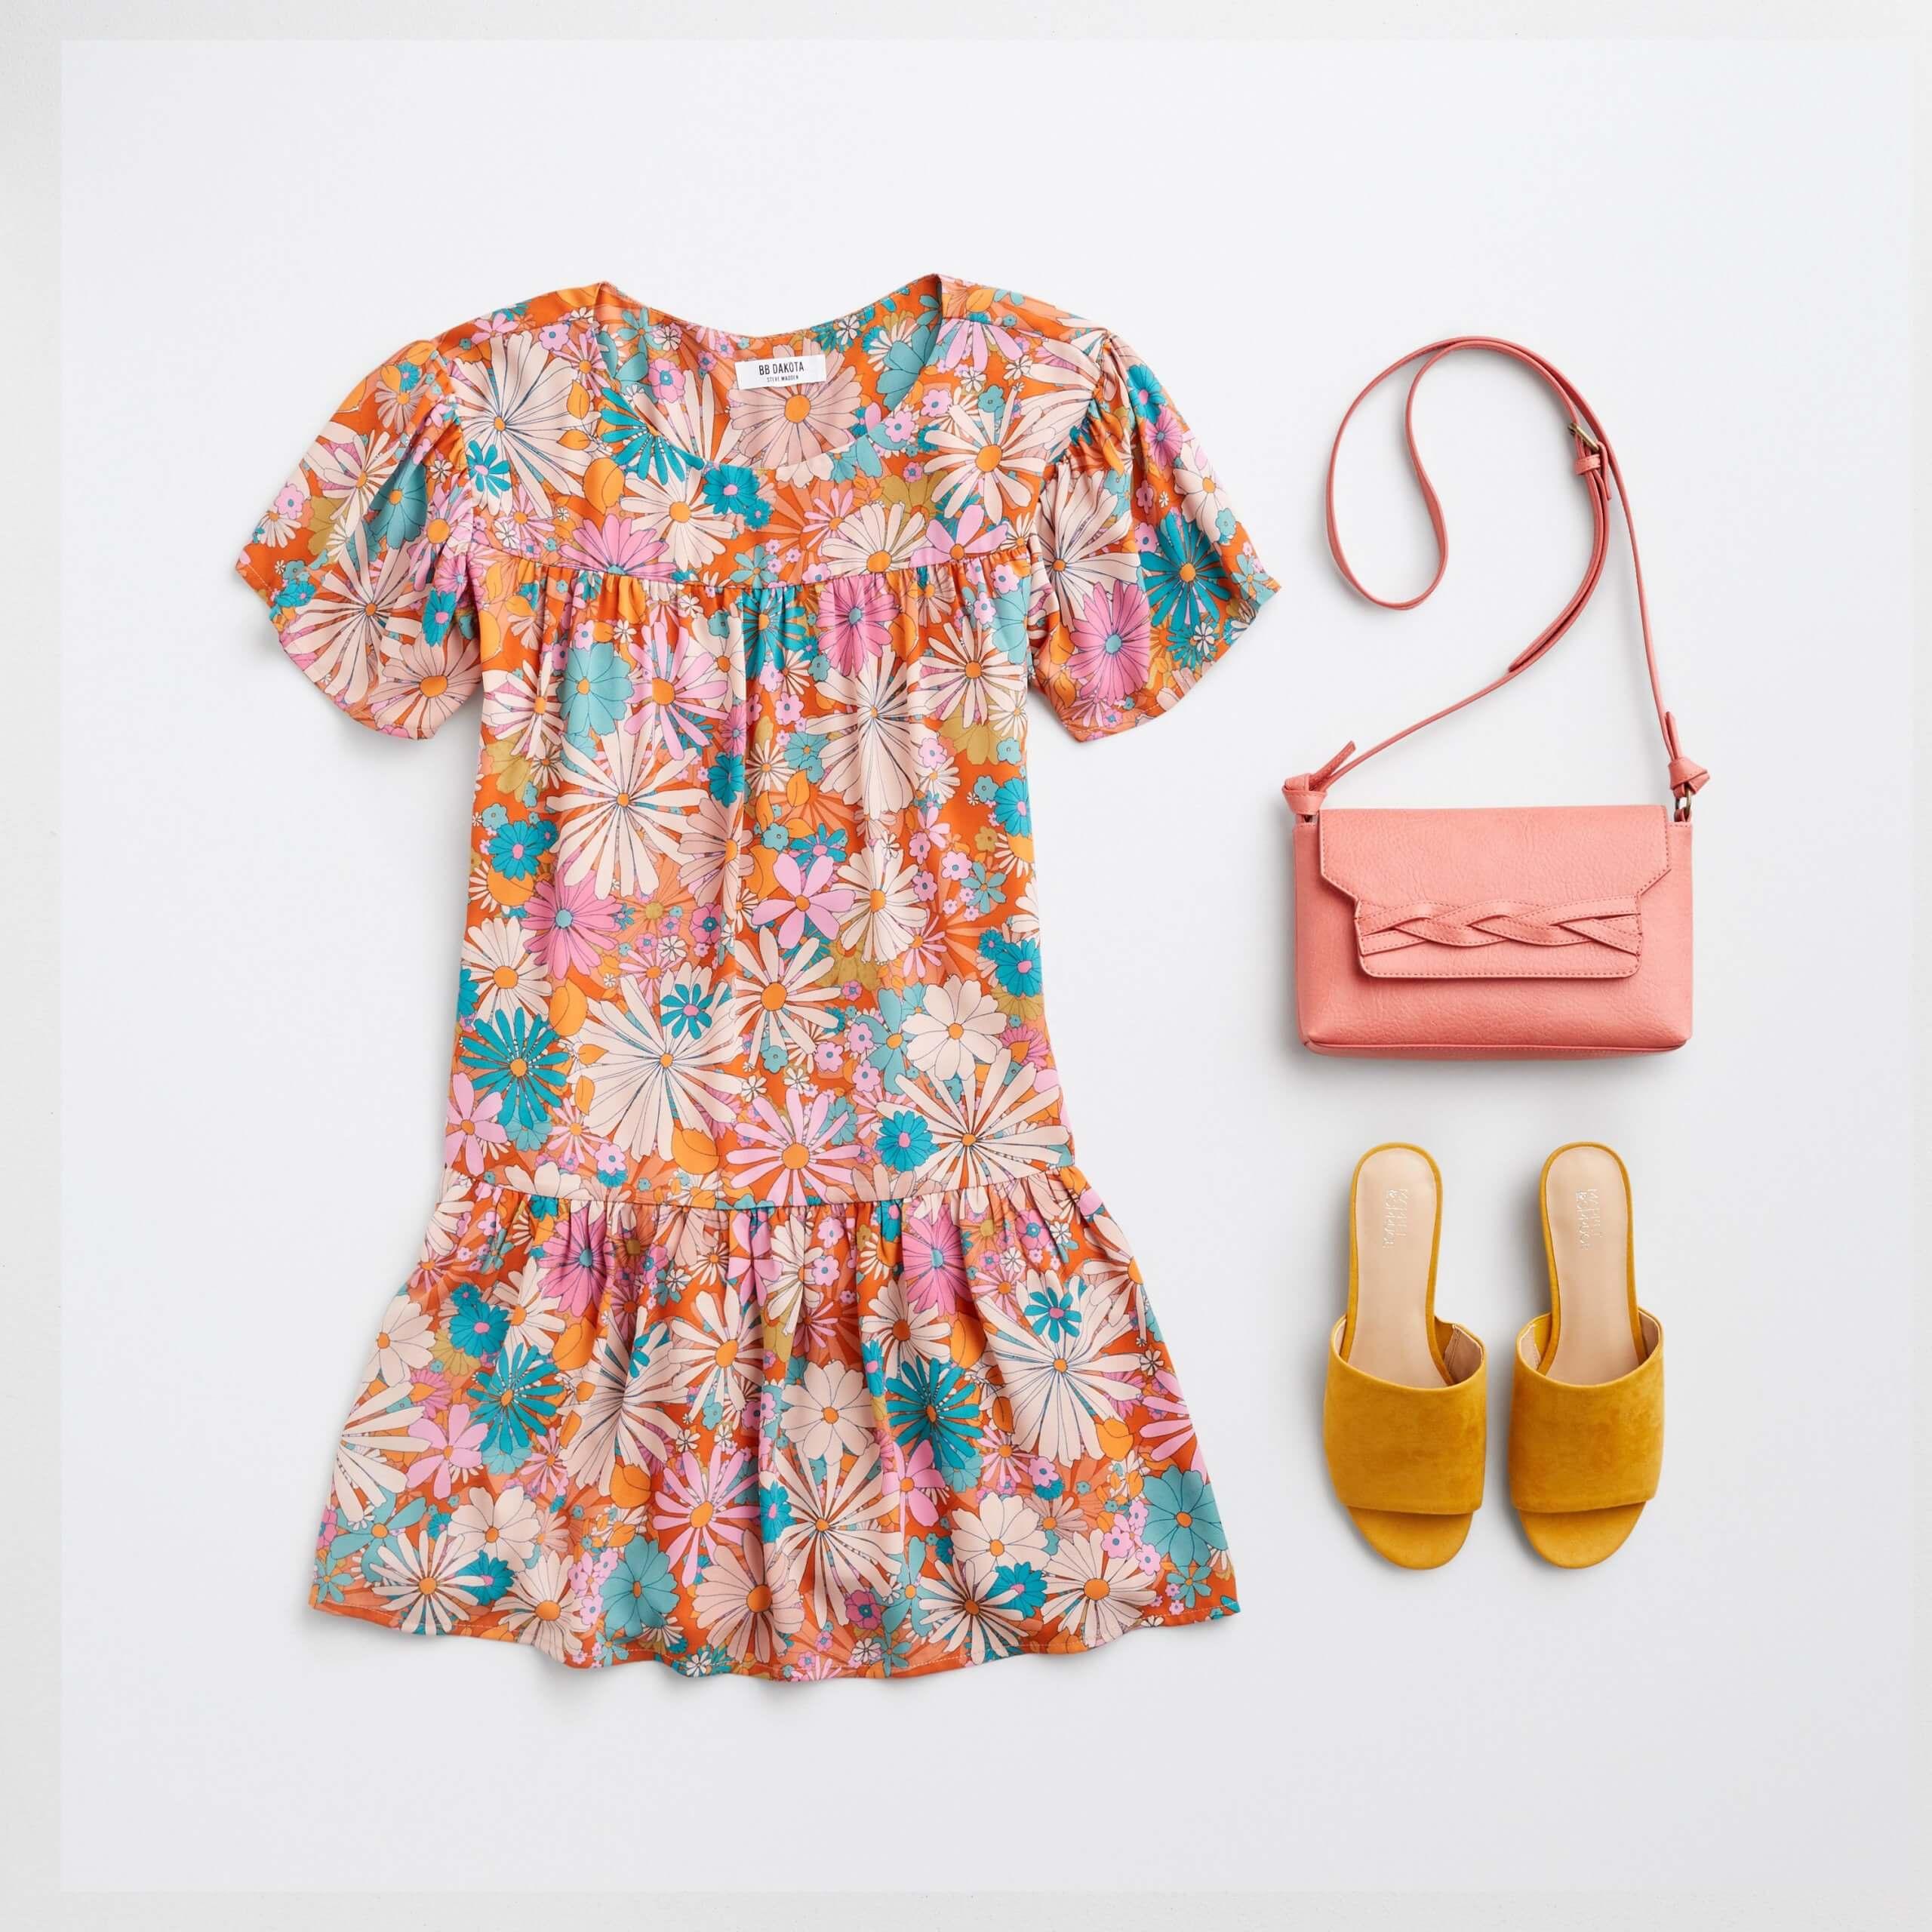 Stitch Fix Women's orange, pink and green floral printed short-sleeve shift dress, pink crossbody bag and mustard slide sandals.